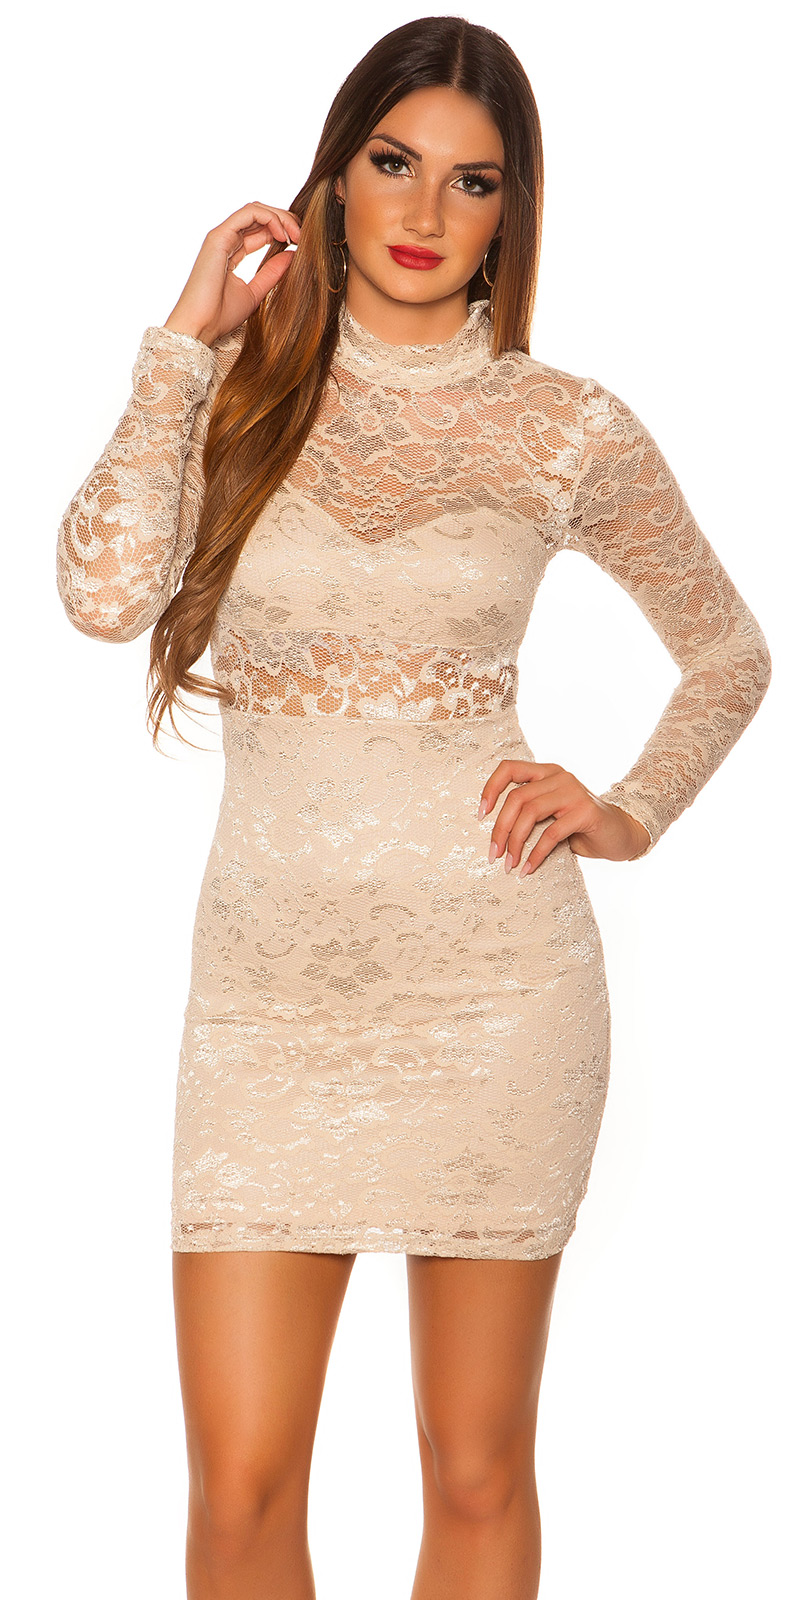 Šaty s dlouhým rukávem 0000IN50242 - Beige